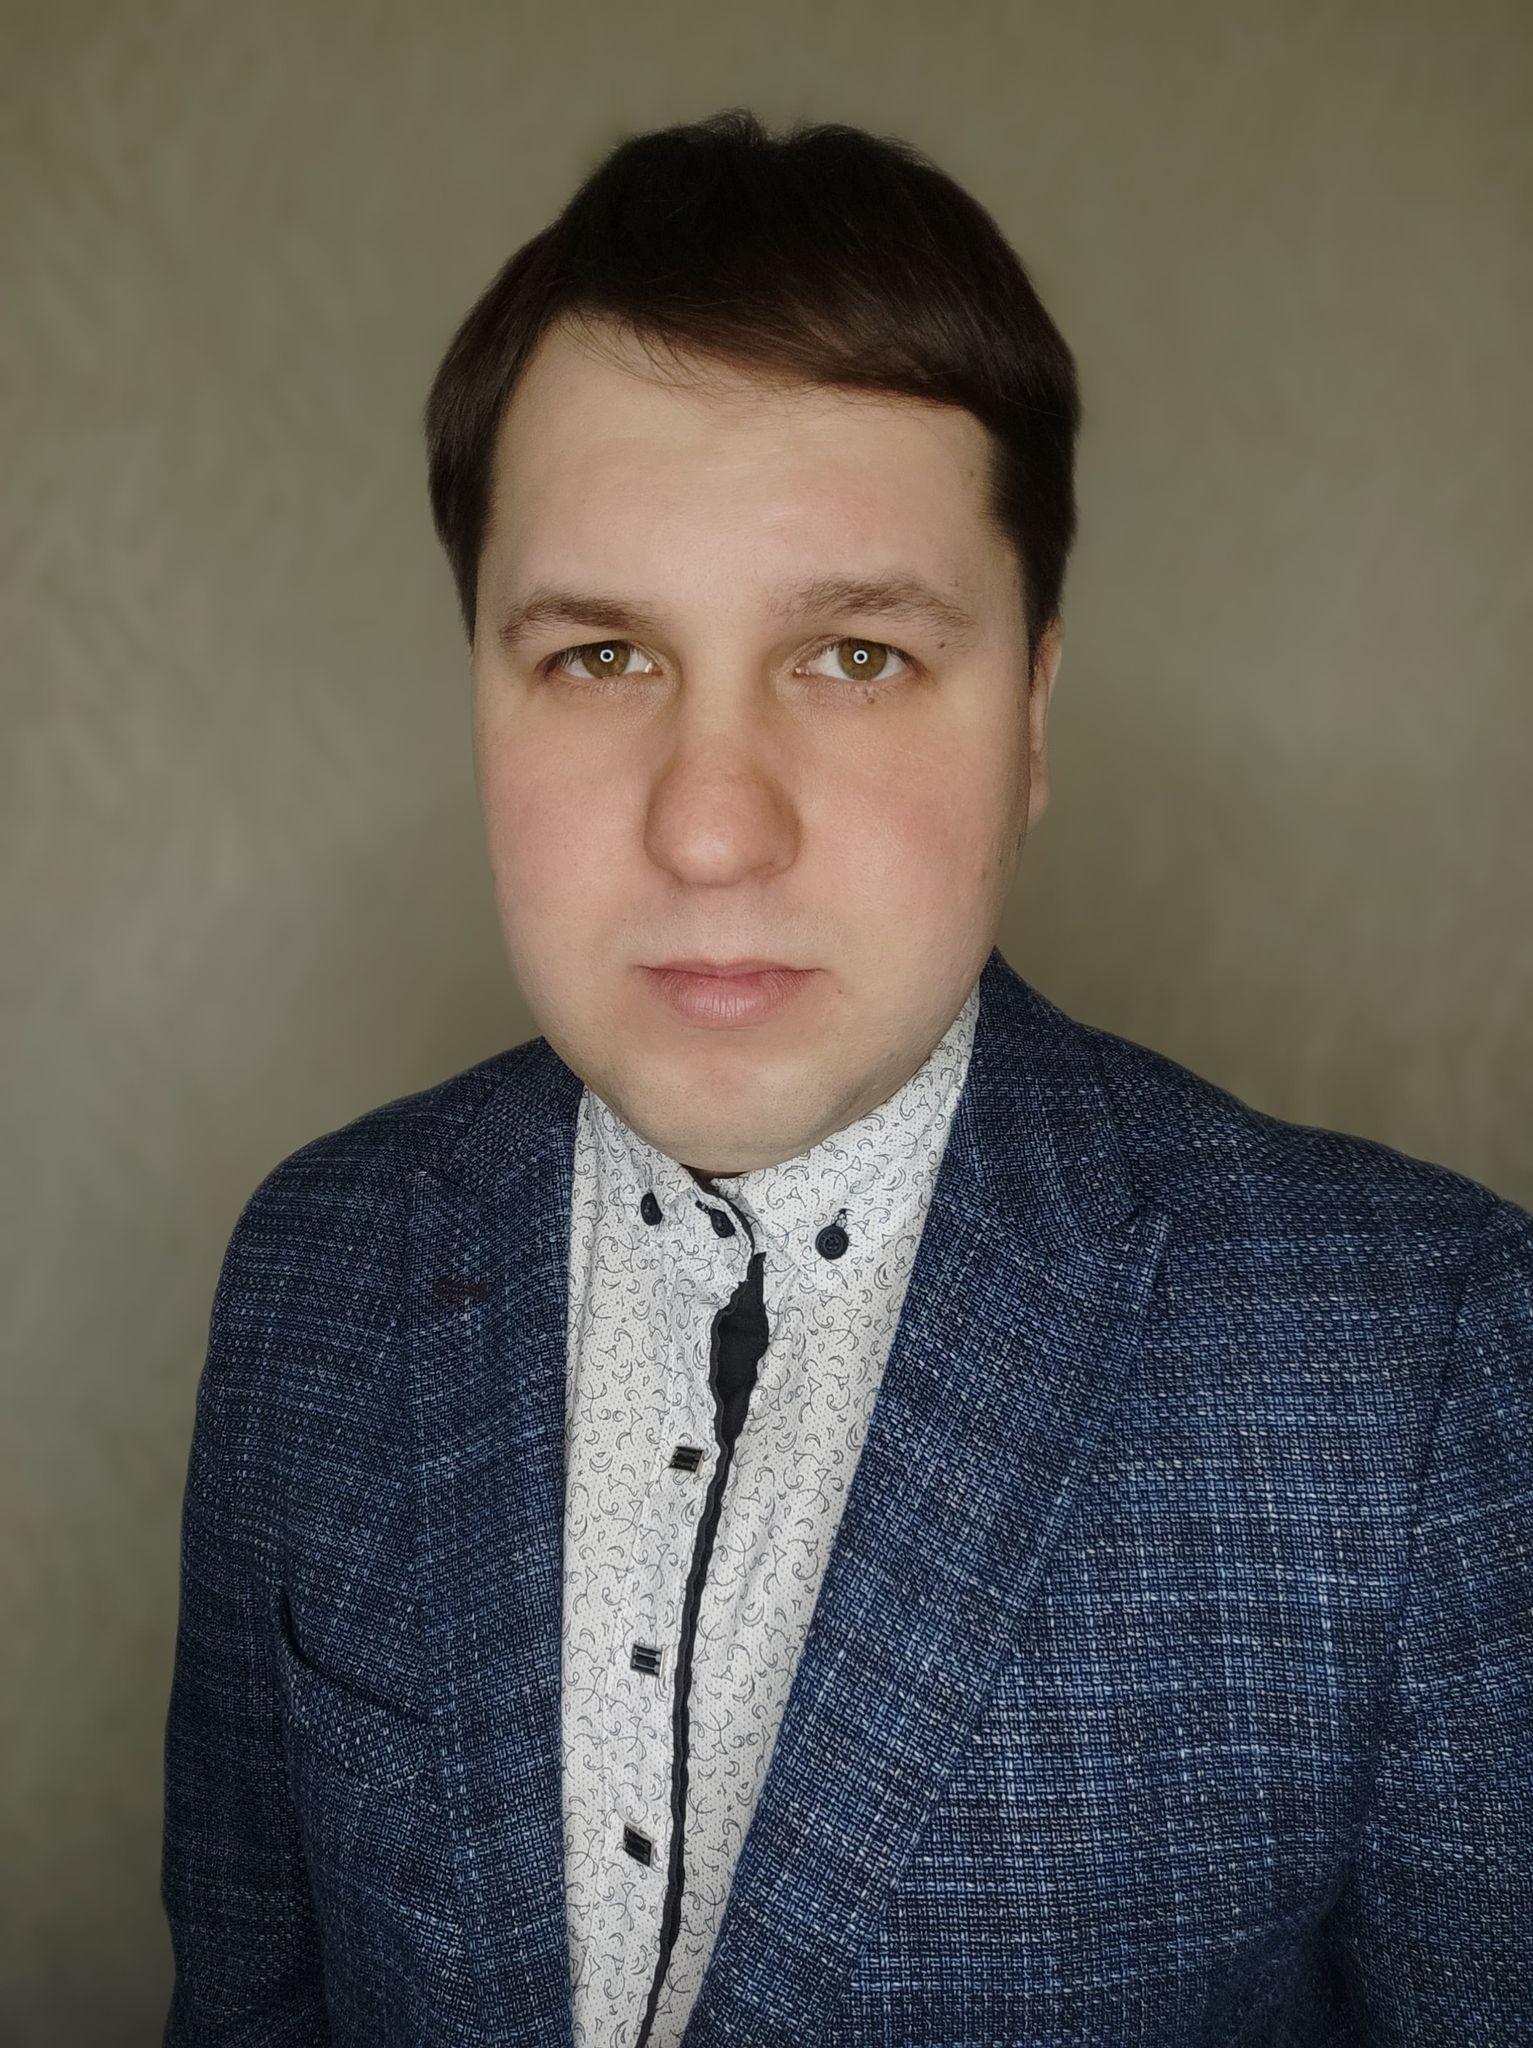 адвокат Латышев Павел Сергеевич, адвокат Латышев П.С.